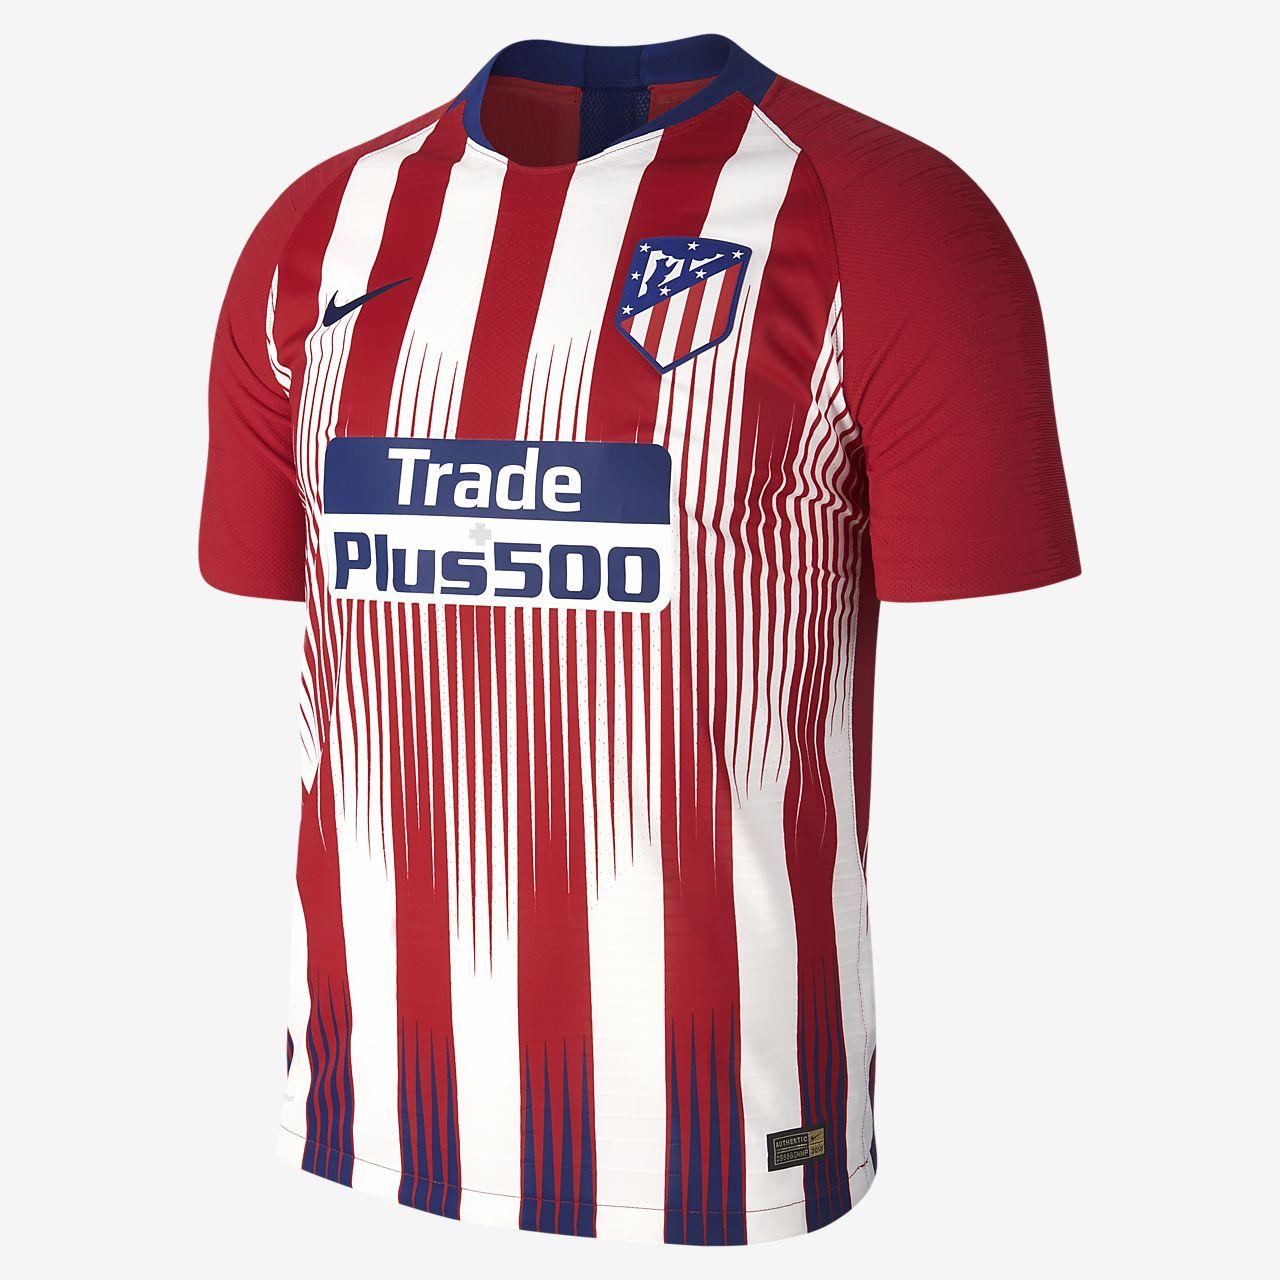 lowest price 0aadd d7528 ... Camiseta de fútbol para hombre de local Vapor Match del Atlético de  Madrid 2018 19